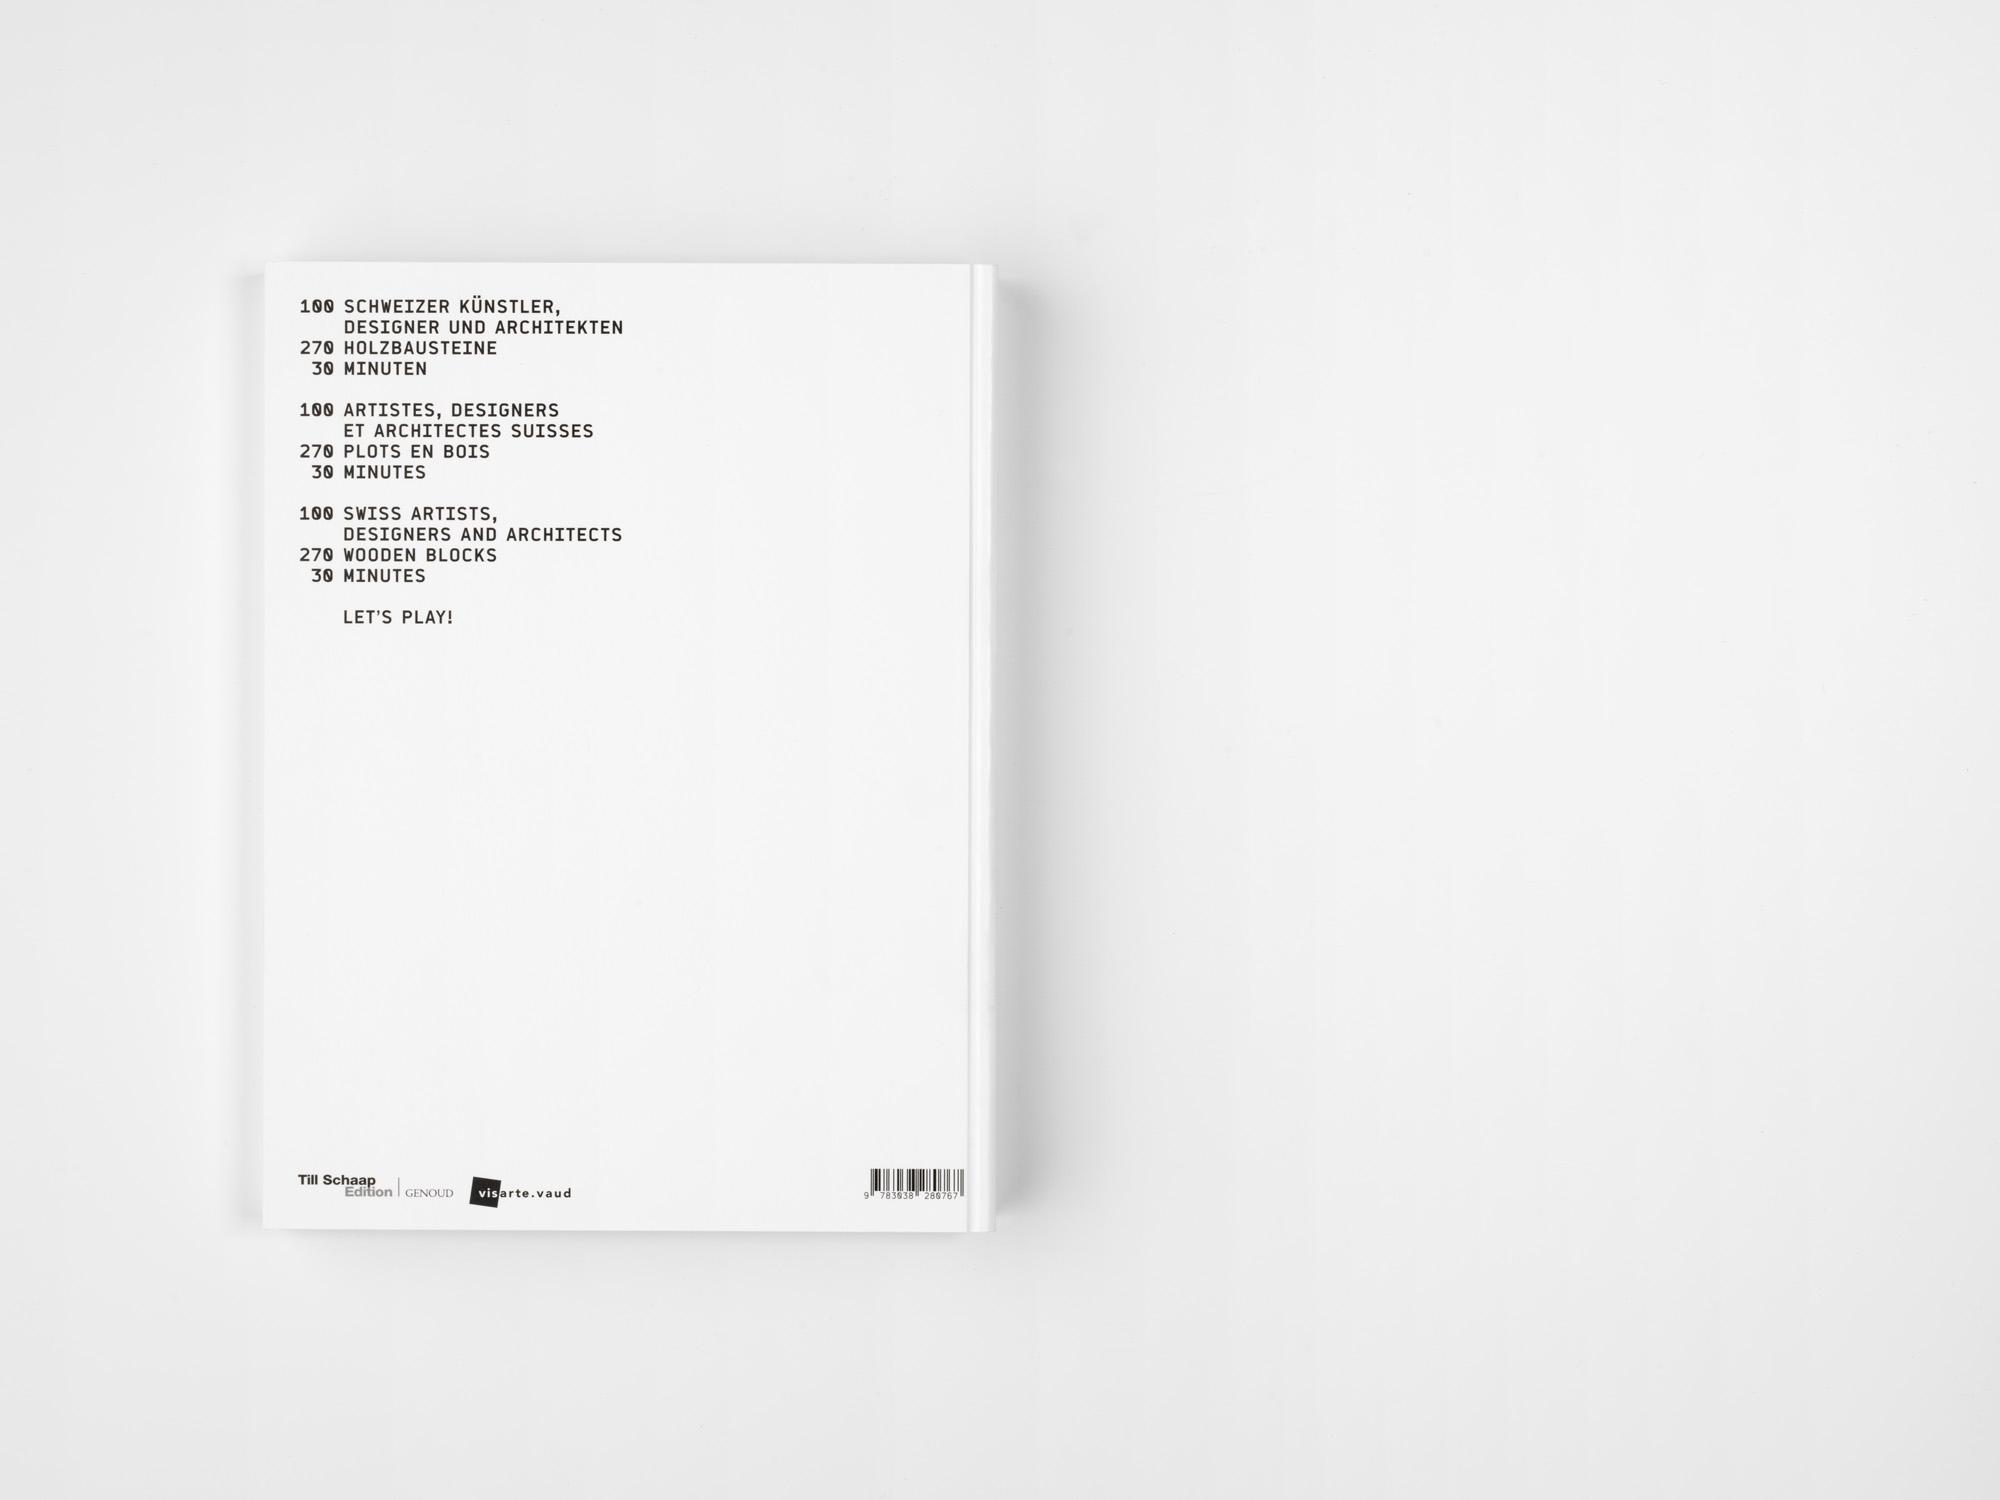 Concept and art direction Christiane Nill // Photographies Lionel Henriod // Graphic design atelier cocchi // Text Michel Thévoz // Co edition Till Schaap edition - Visarte Vaud // Impression Genoud SA